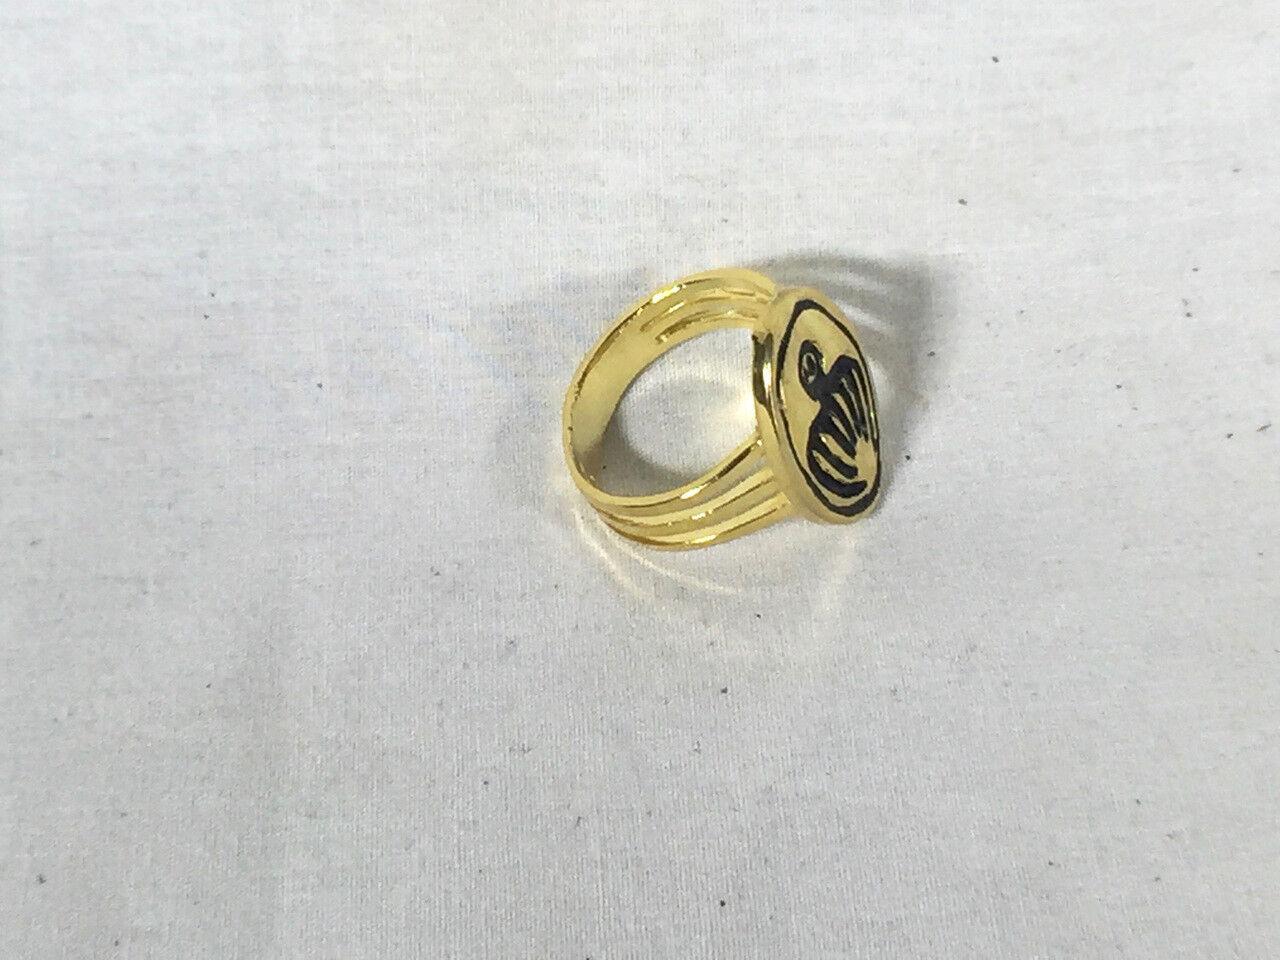 007 james bond, thunderball spectre ring metal, very detailed